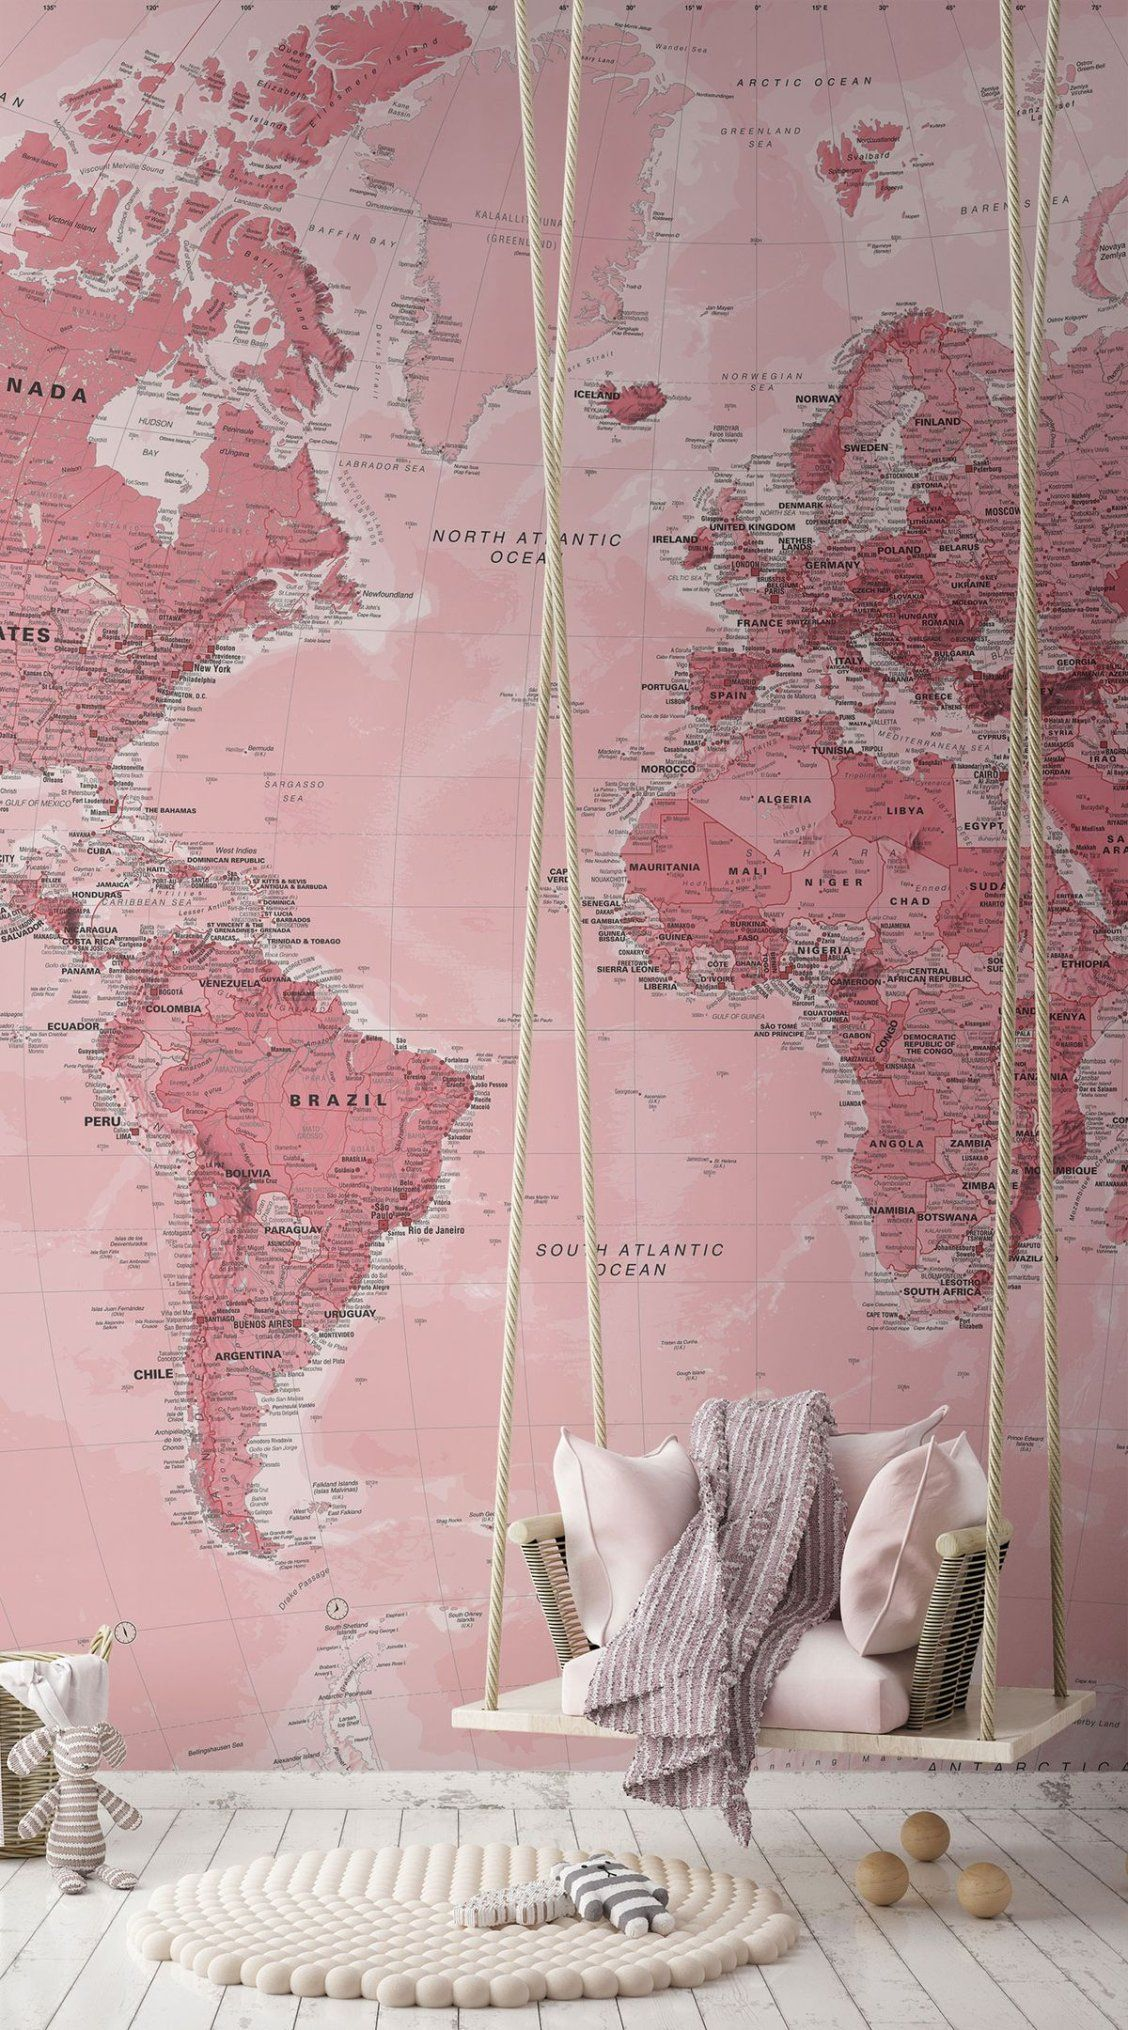 Millennial Pink Wallpaper Decorating Tips #designwallpaper